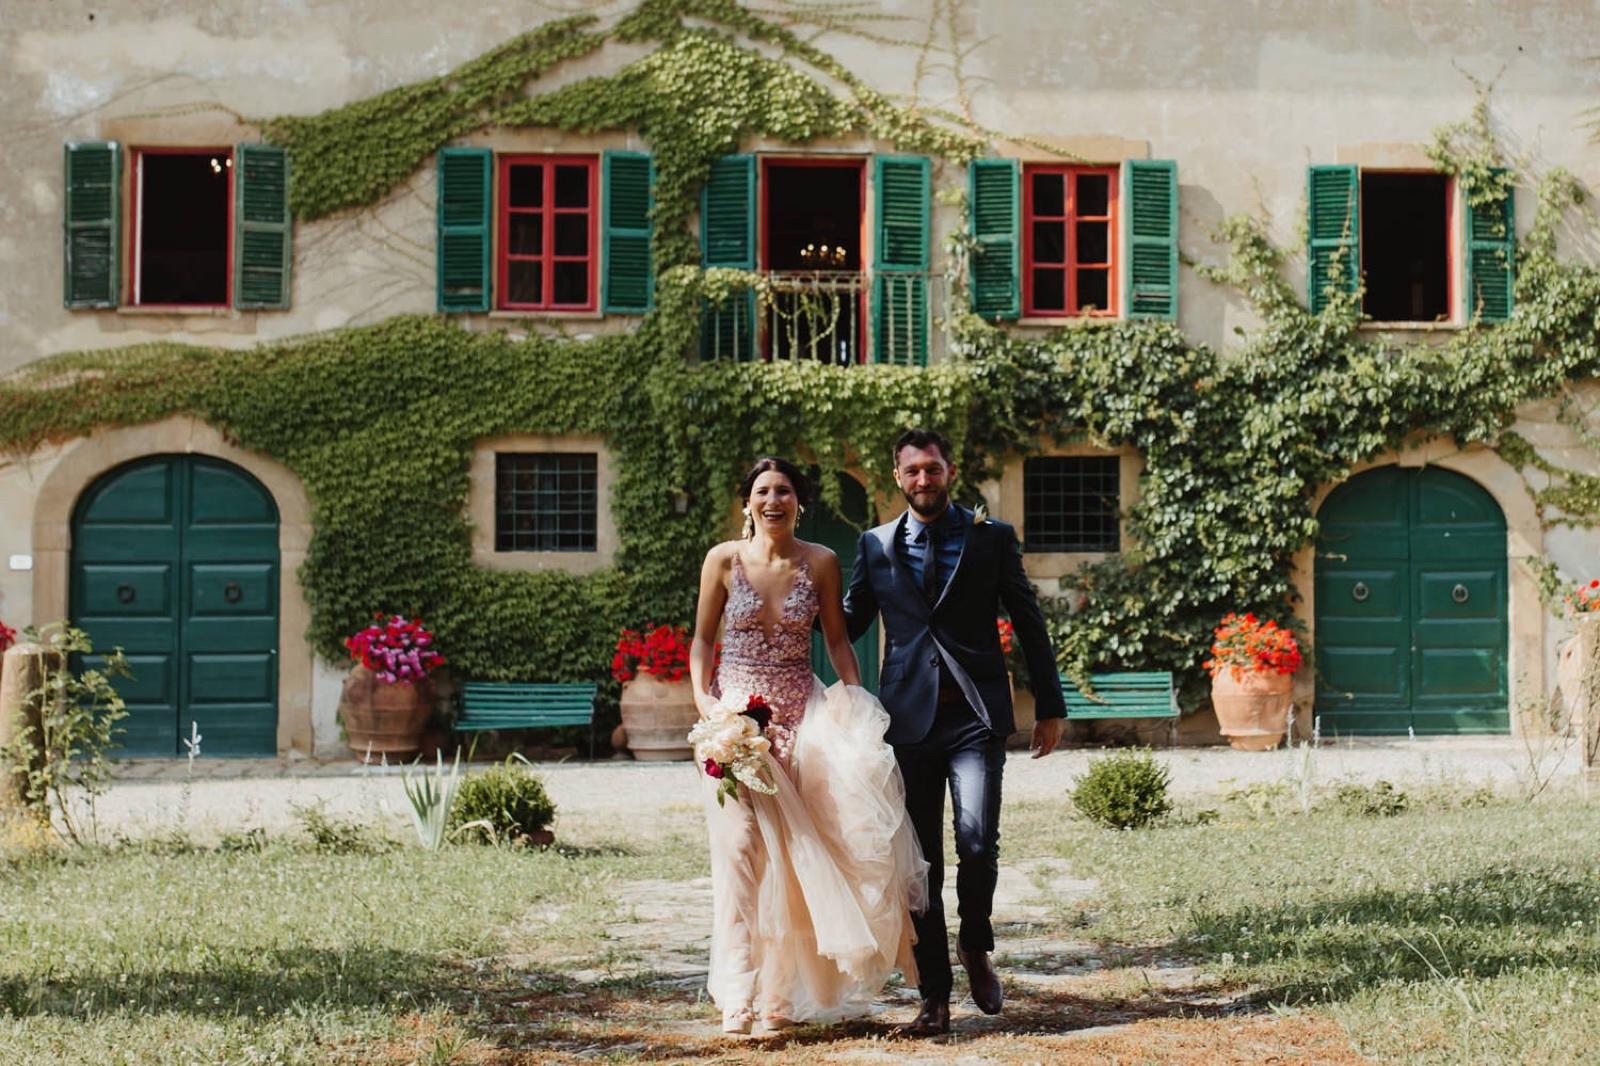 Fotomagoria Best 0f 2018 Wedding Photographer Italy75.jpg